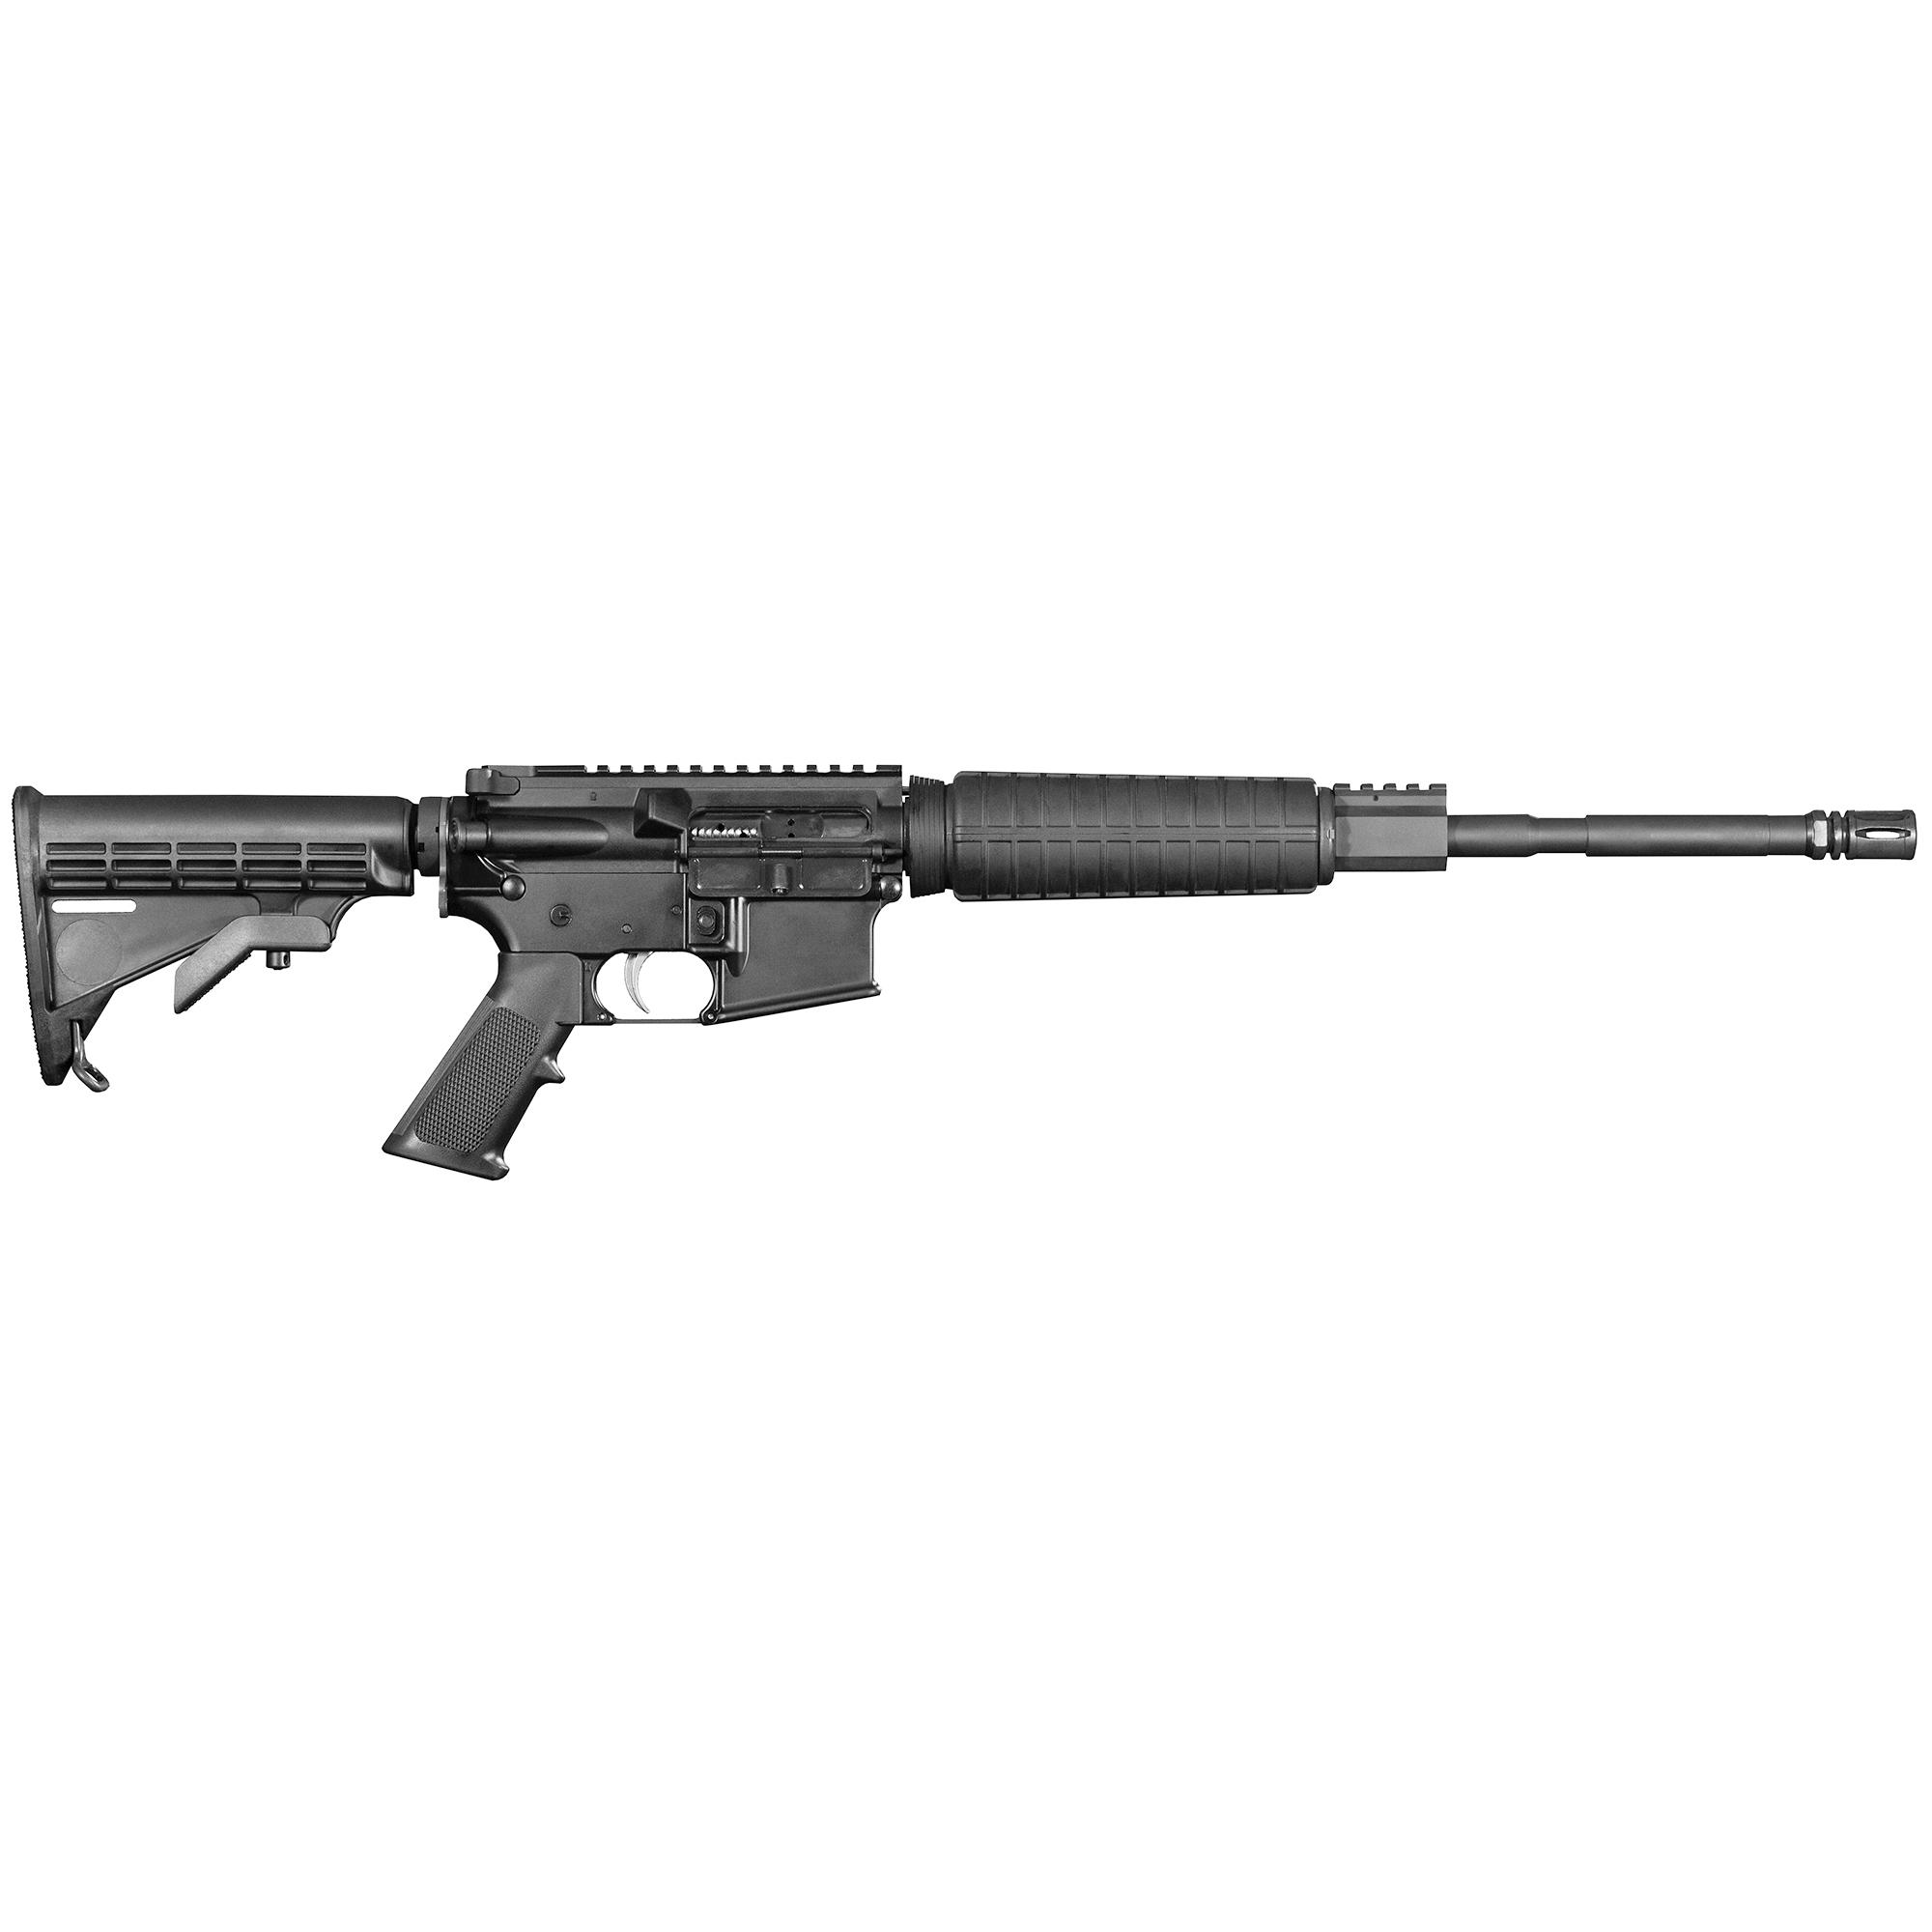 Anderson Rifles AM15 Optics Ready Centerfire Rifle thumbnail